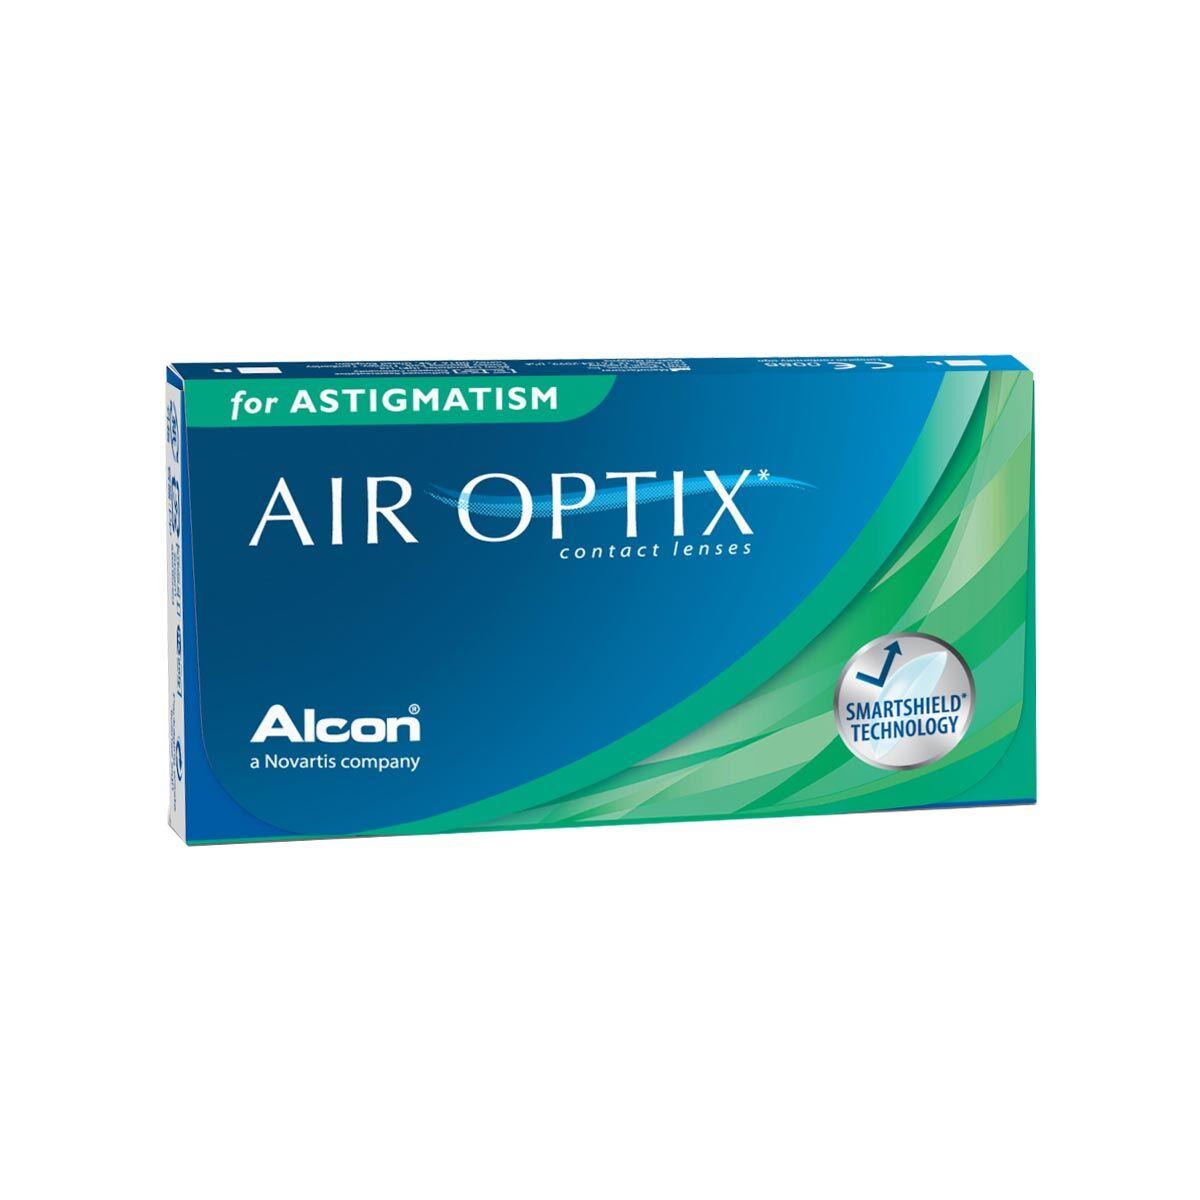 Alcon Air Optix for Astigmatism (3 Contact Lenses), Ciba Vision/Alcon, Silicone Hydrogel Toric for Astigmatism, Lotrafilcon B